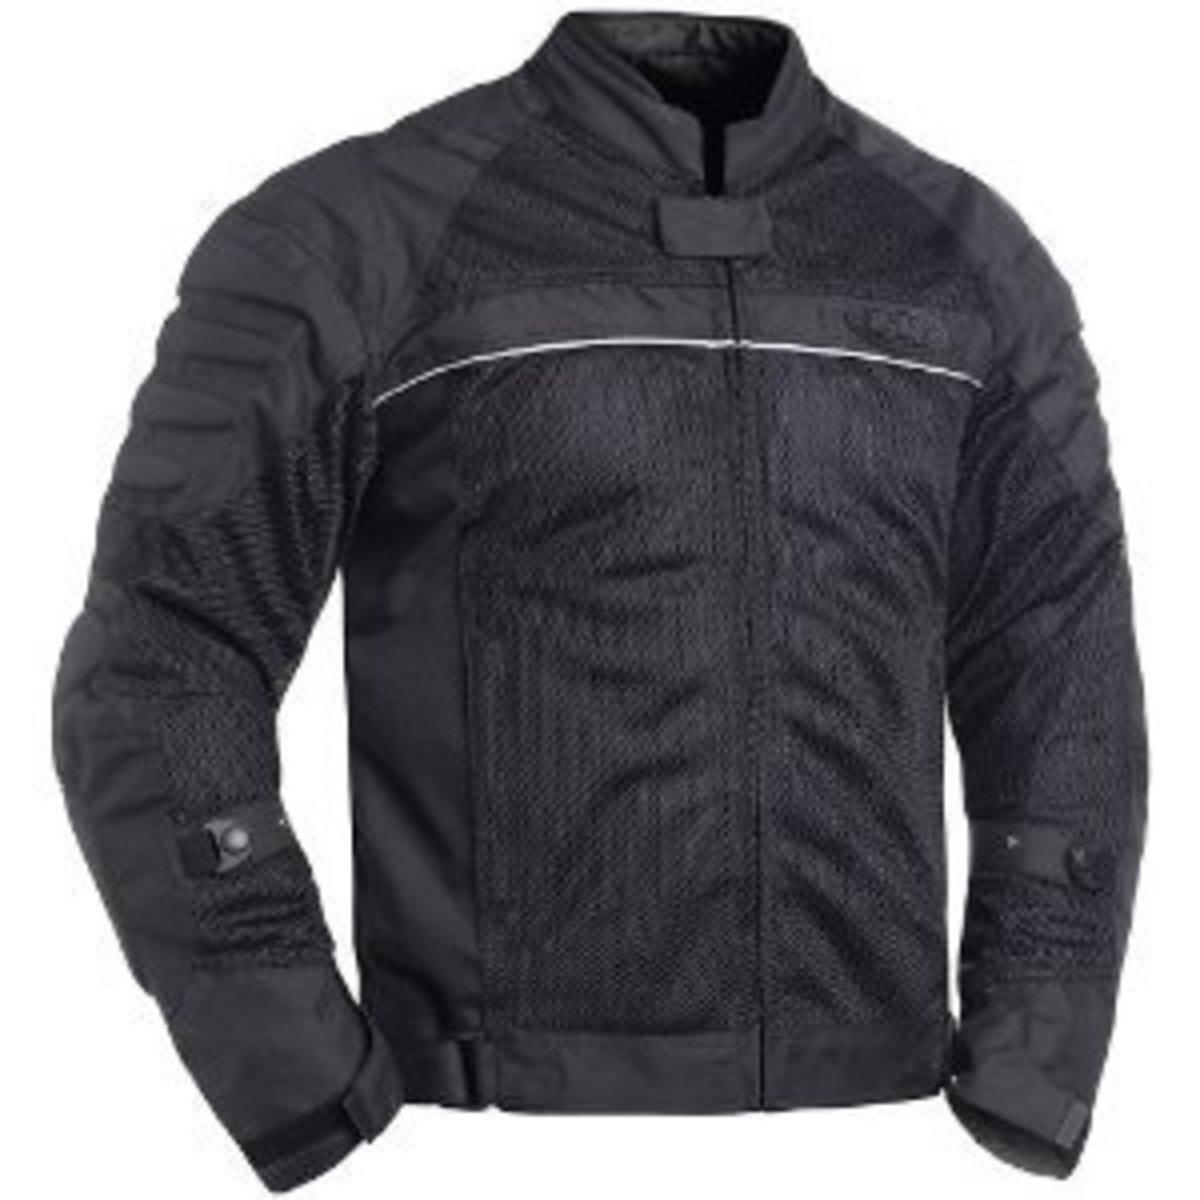 BILT Blaze Mesh motorcycle jacket in black